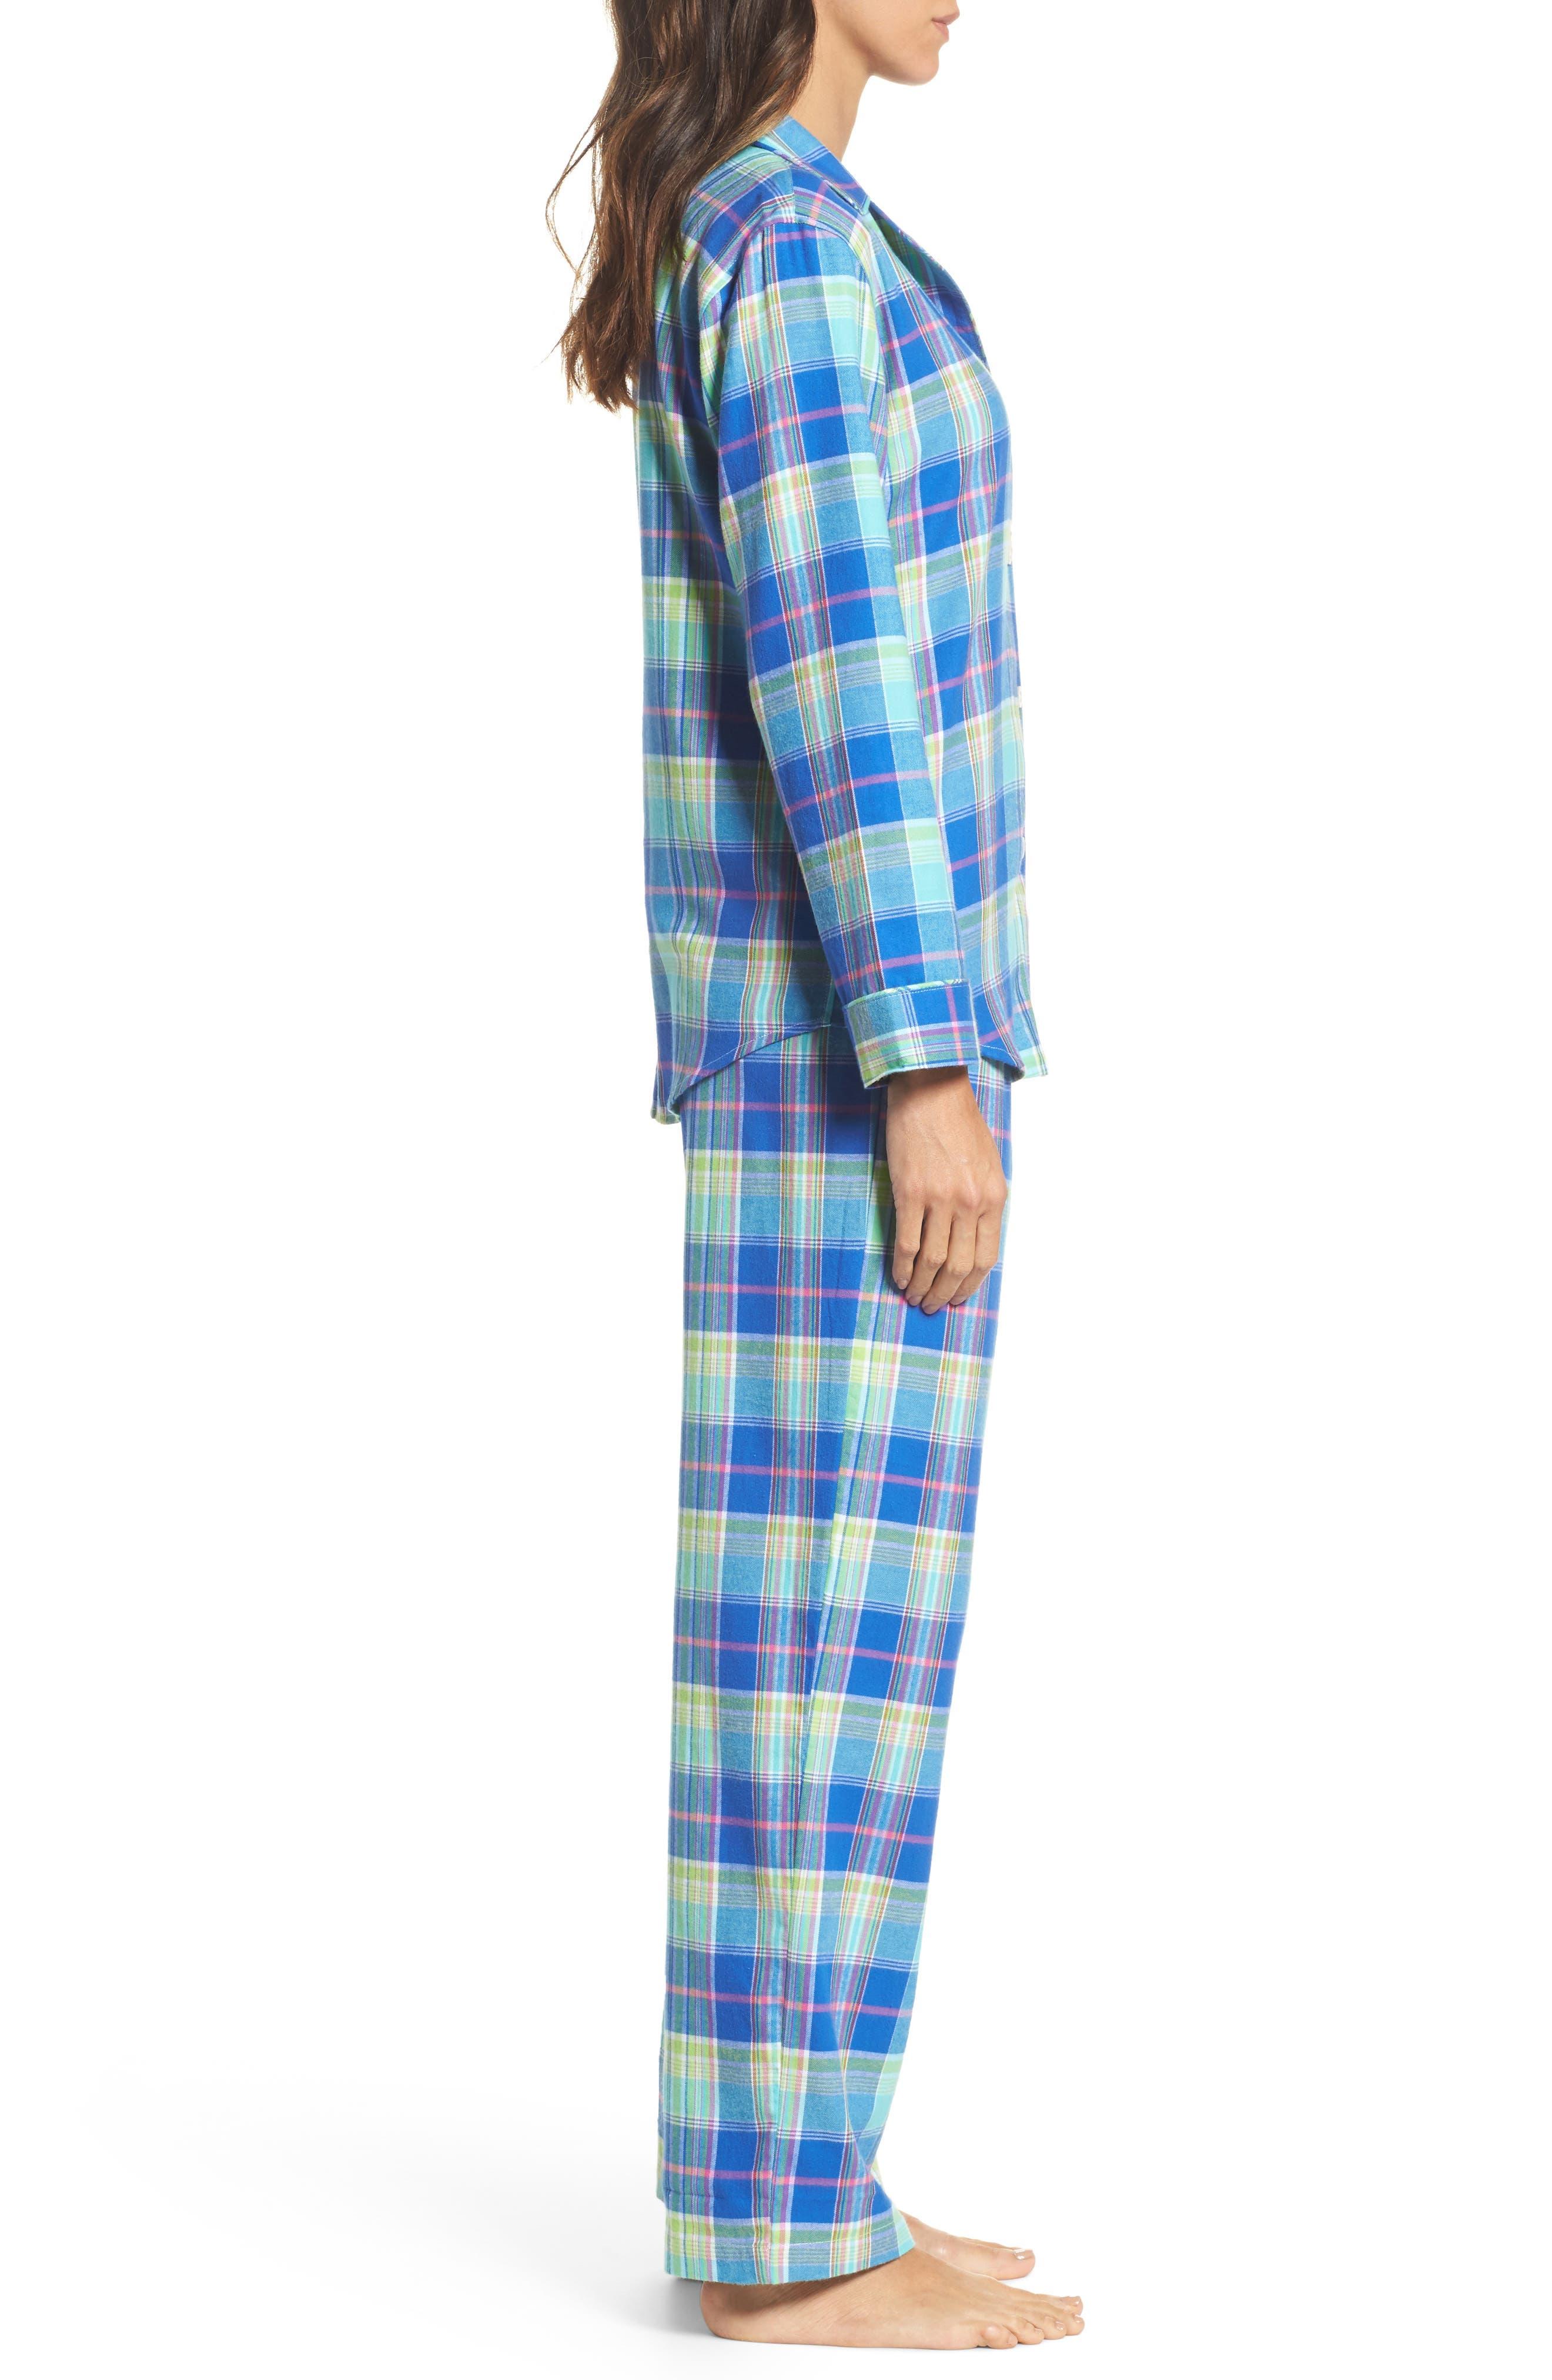 Notch Collar Pajamas,                             Alternate thumbnail 3, color,                             Turquoise Multi Plaid